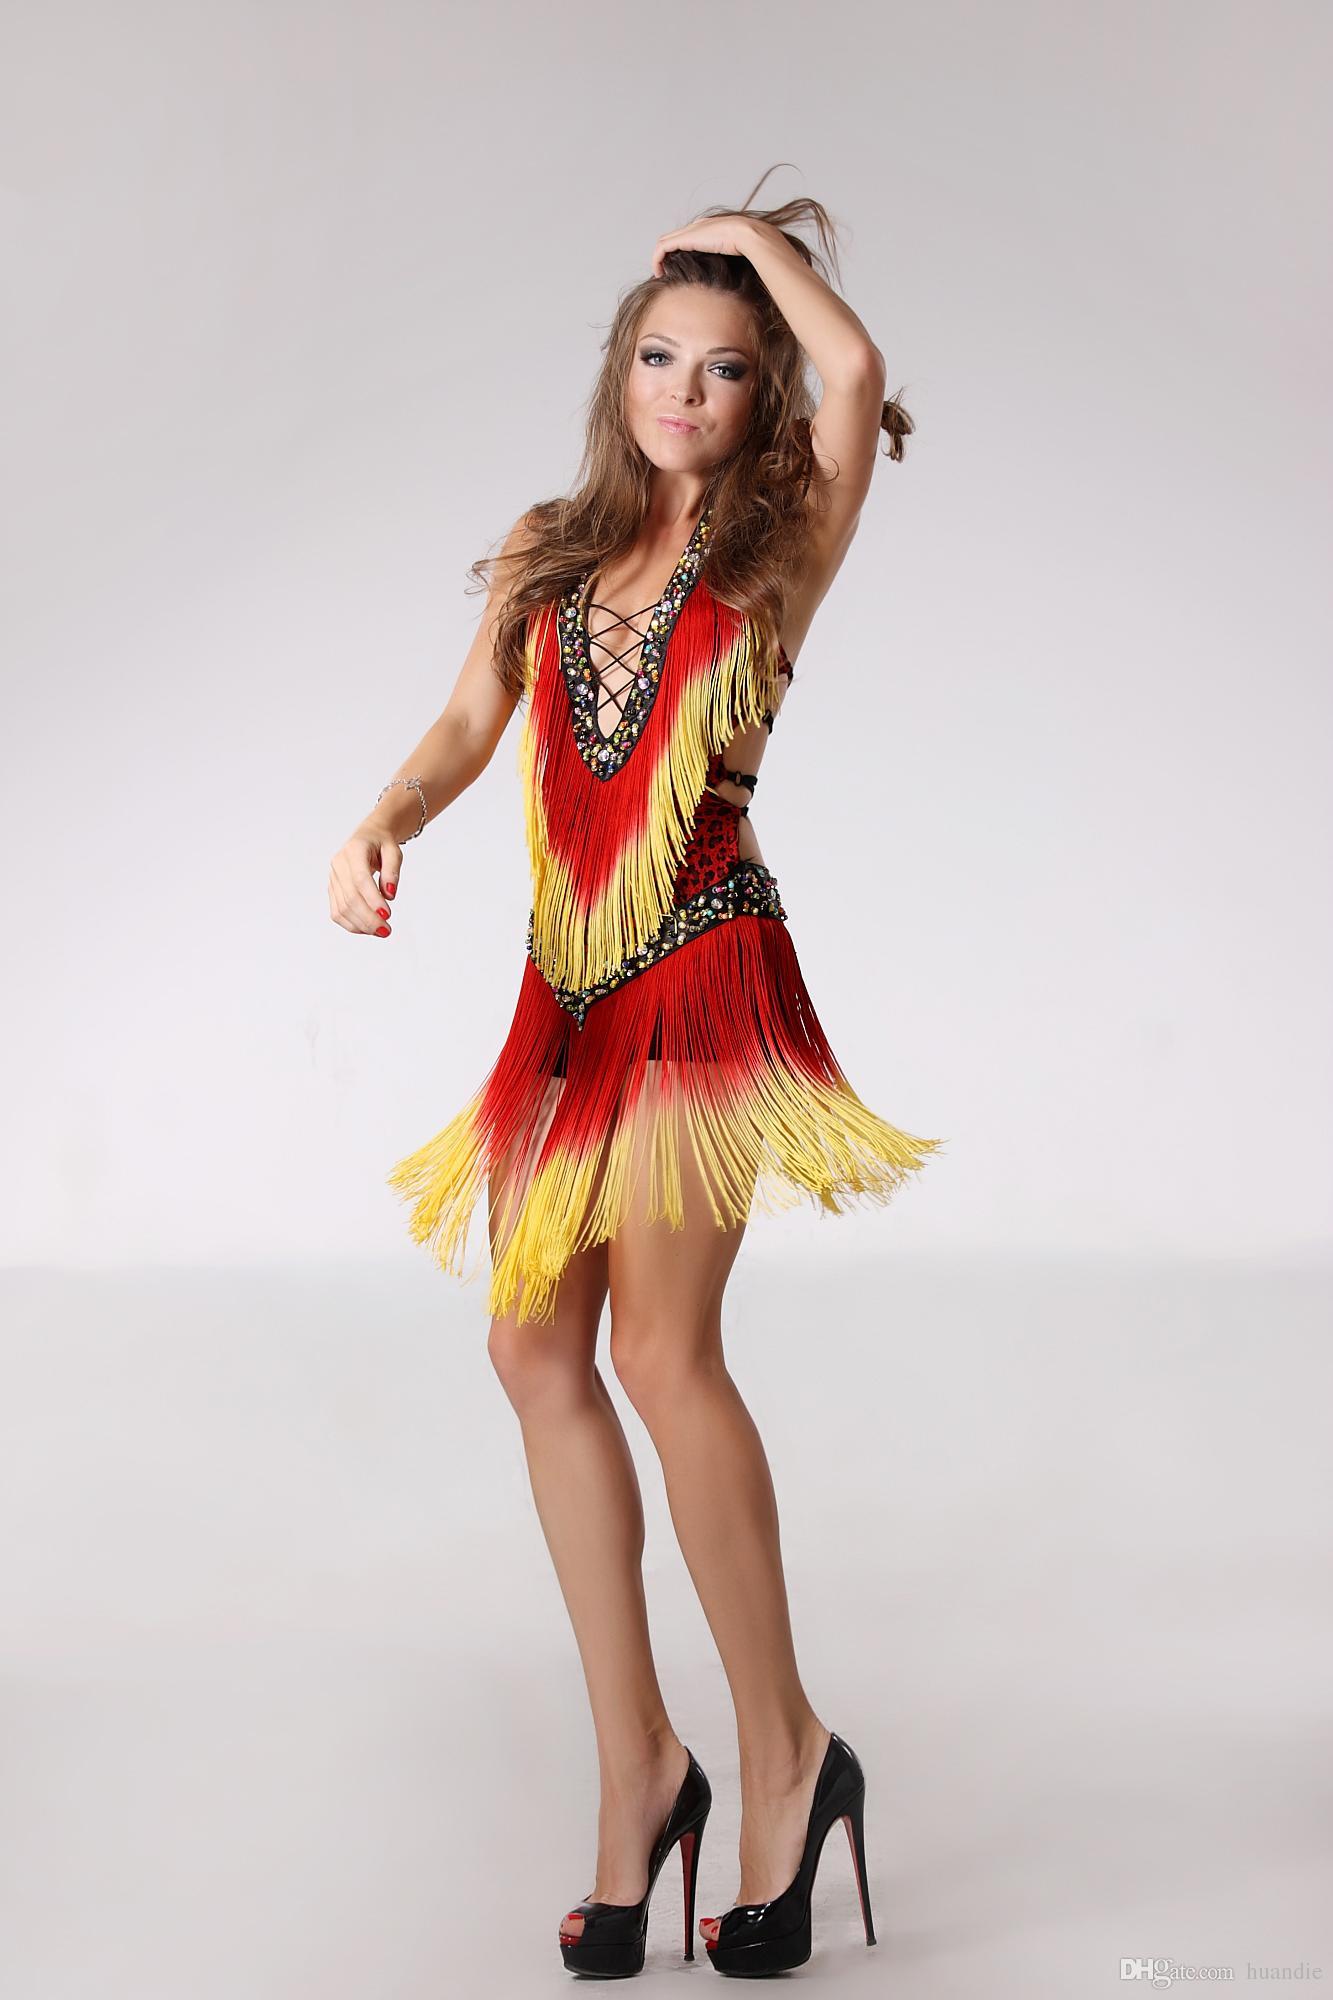 d61c4824a Borla flecos de las mujeres del salón de baile latino salsa cha cha Samba  rumba jive dancewear competencia Lentejuela trajes de disfraces